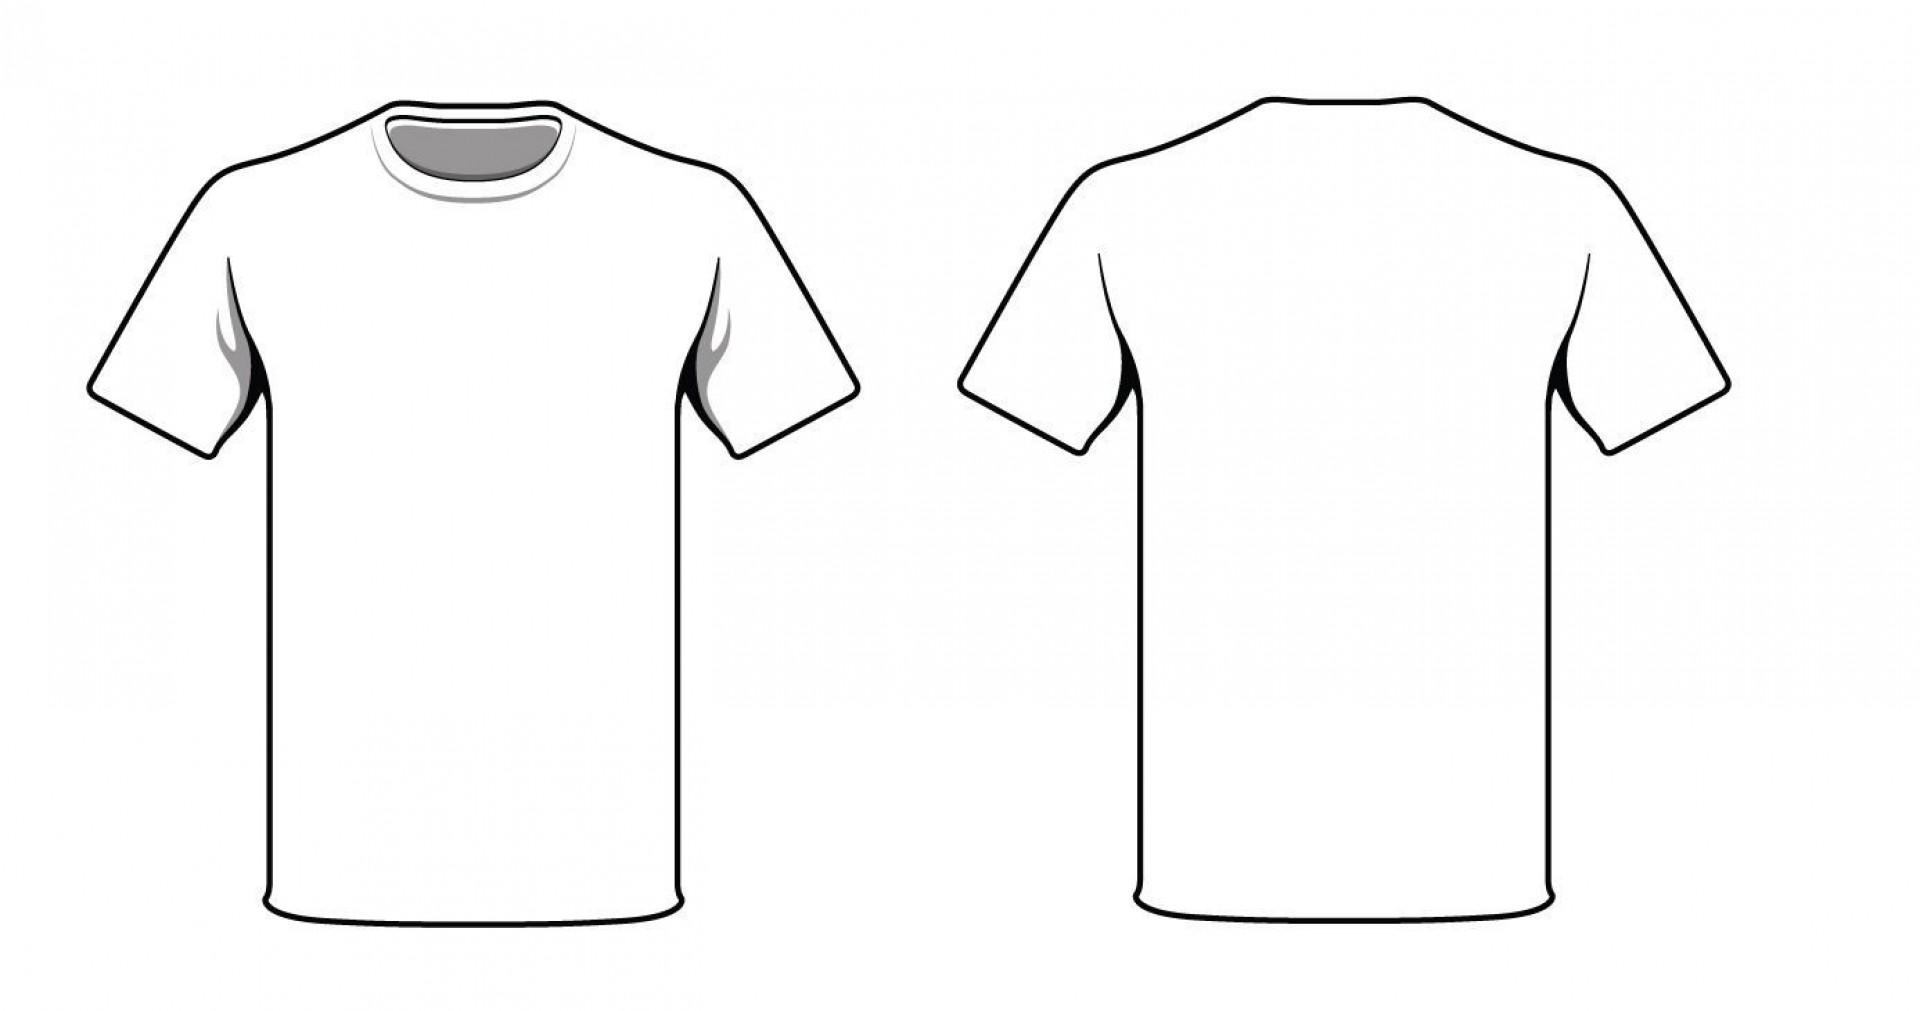 002 Unforgettable T Shirt Design Template Ai Sample  Tee1920